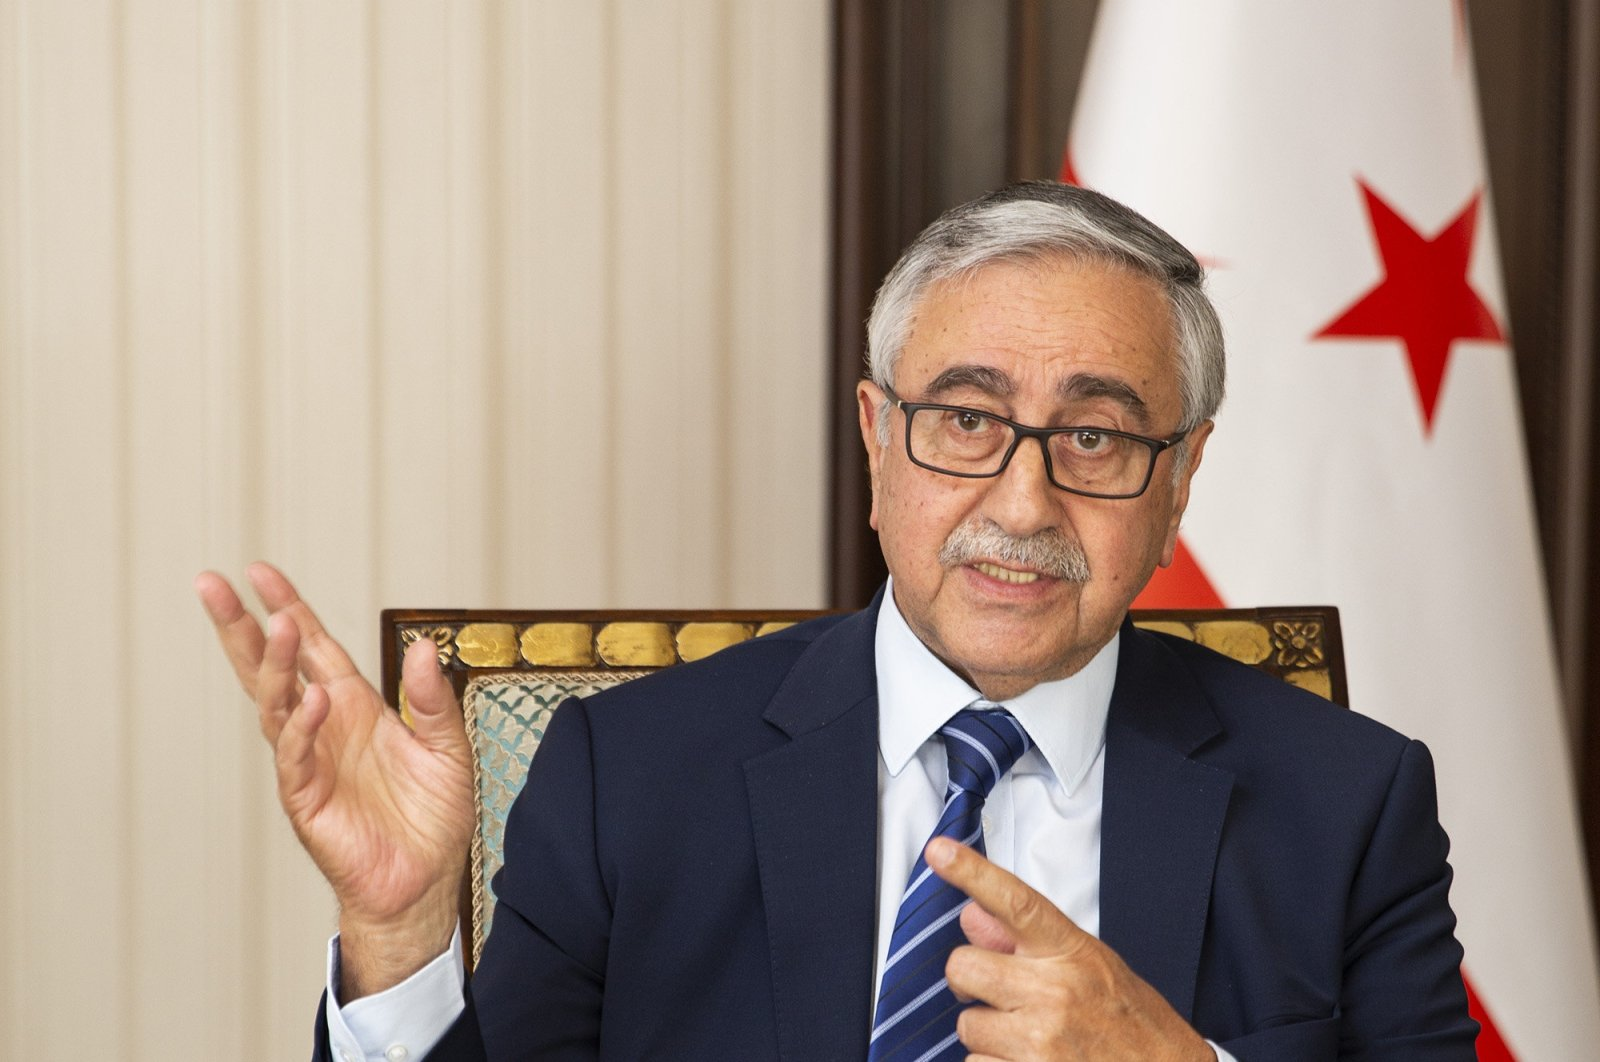 Turkish Republic of Northern Cyprus' (TRNC) President Mustafa Akıncı, July 14, 2019. (AA Photo)